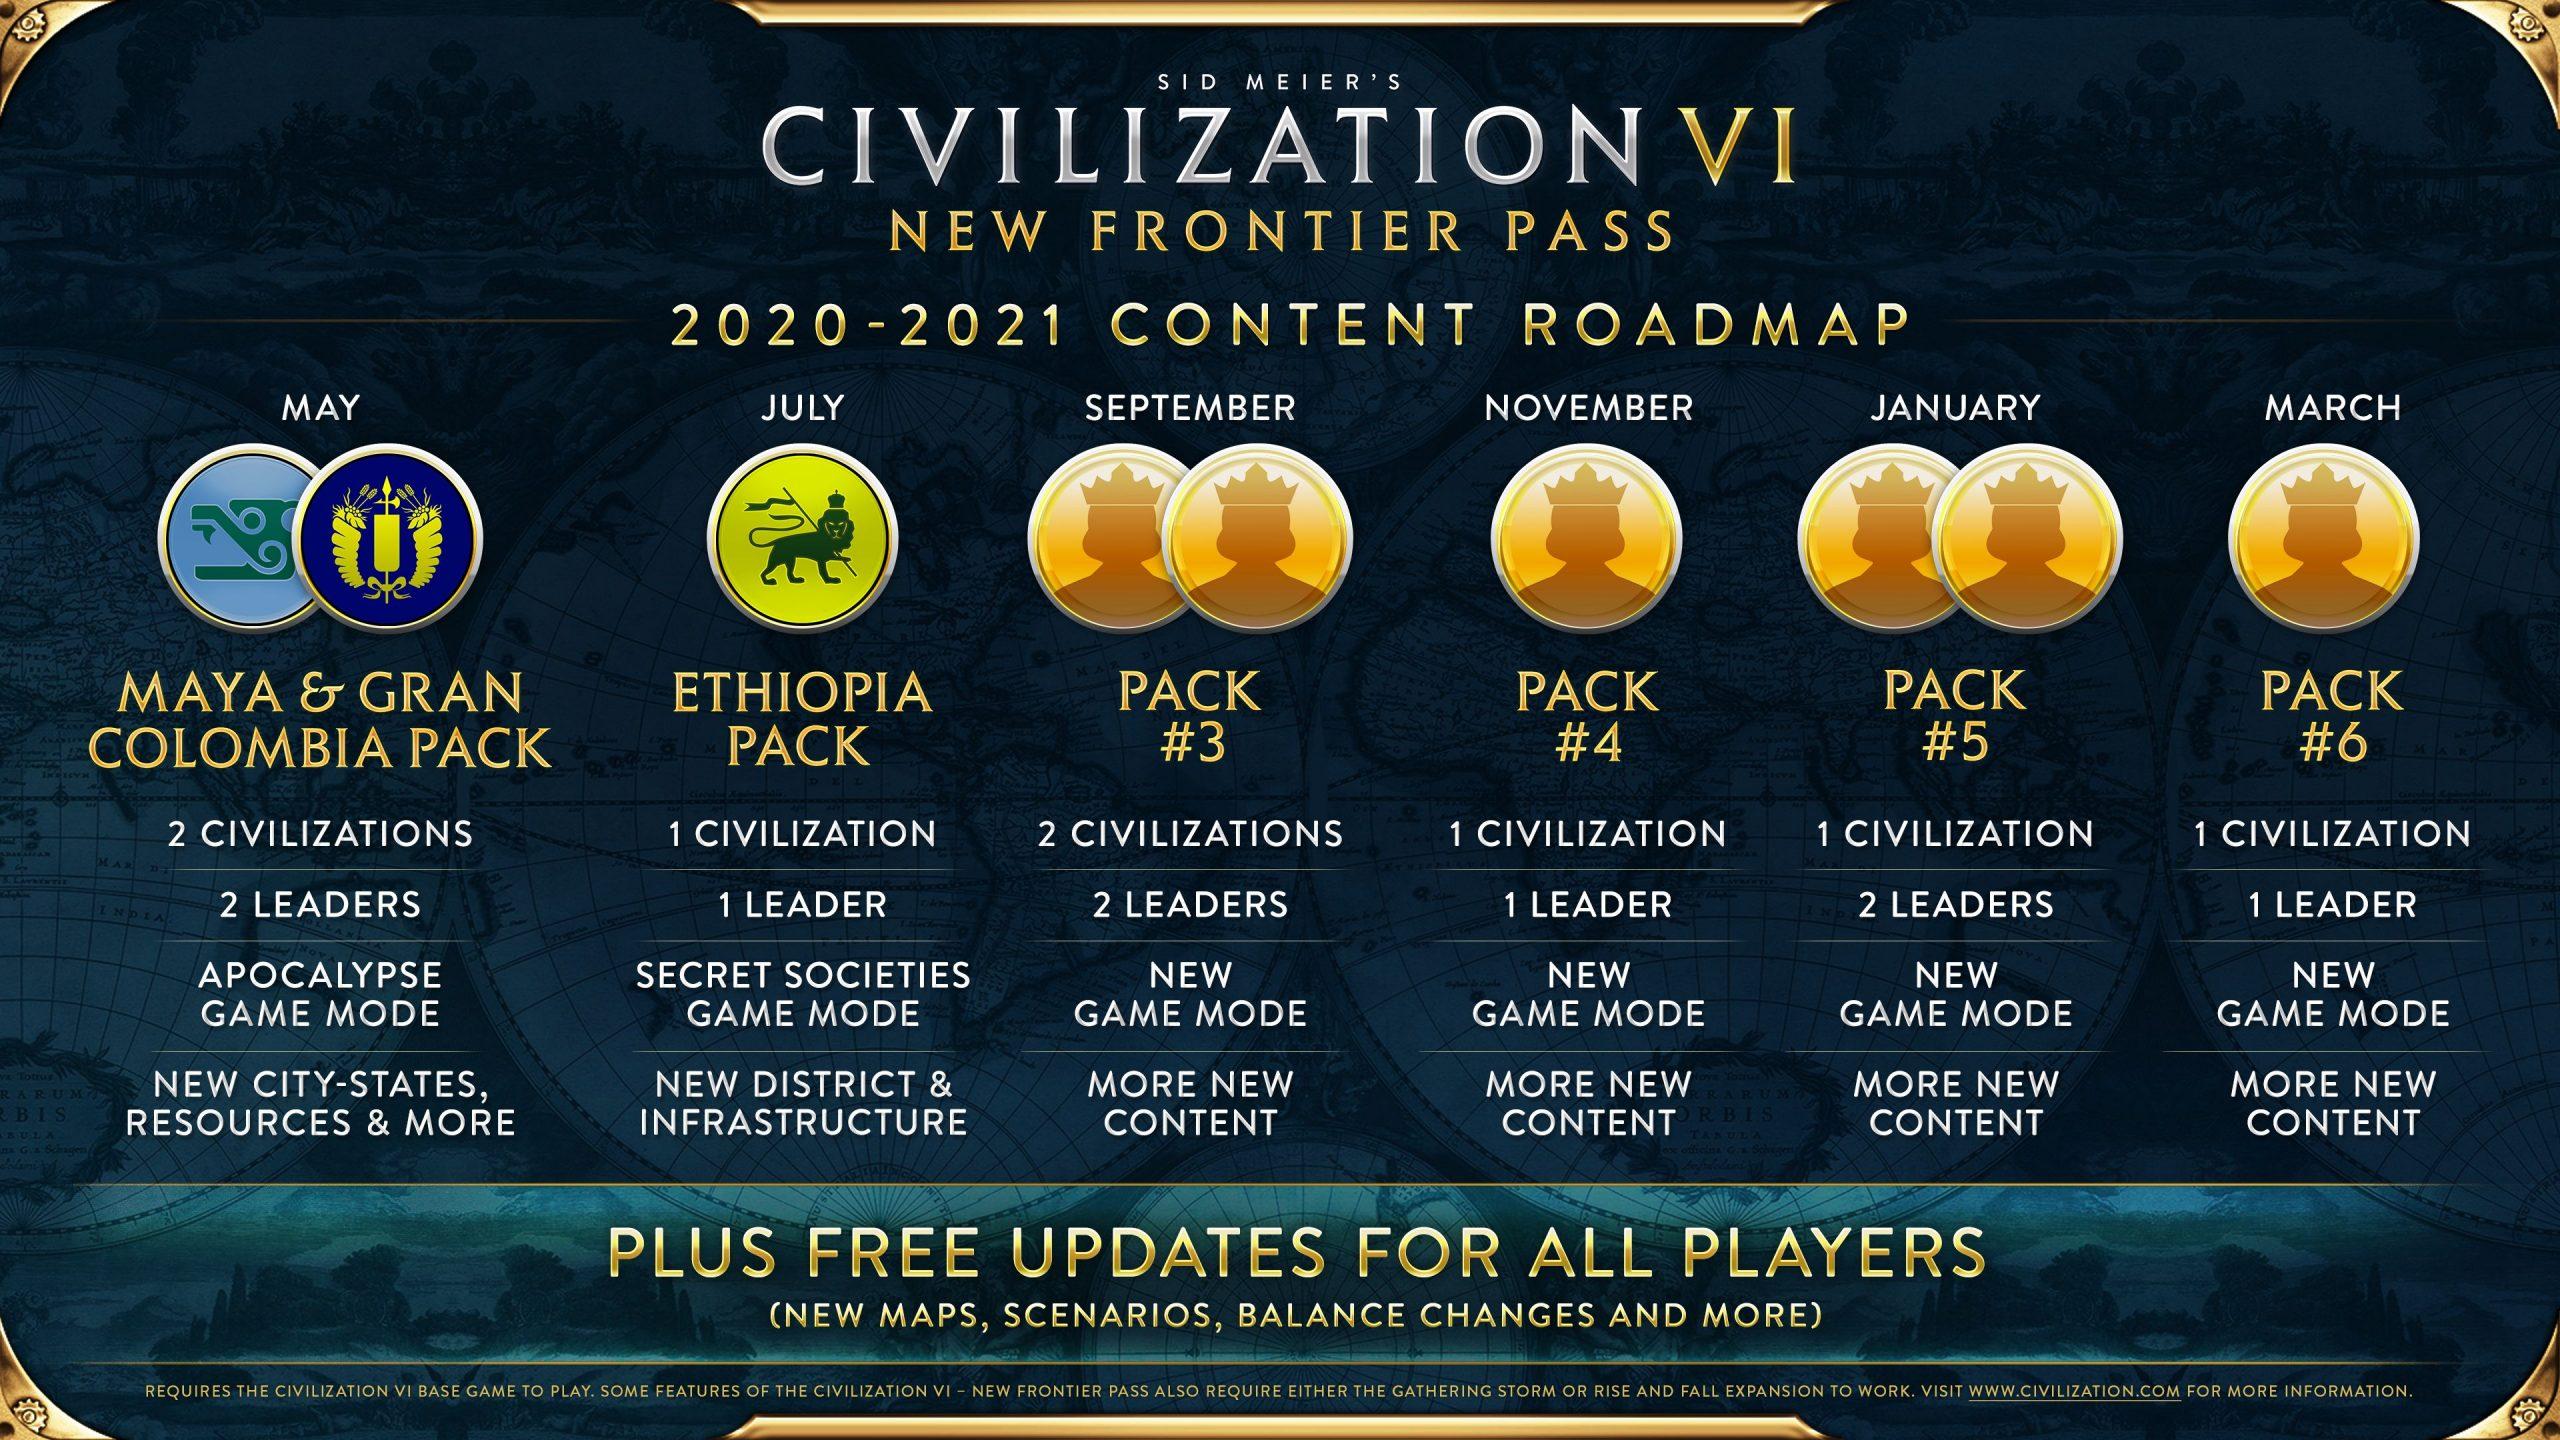 Sid Meier's Civilization VI New Frontier Pass New Frontier Pass season pass roadmap